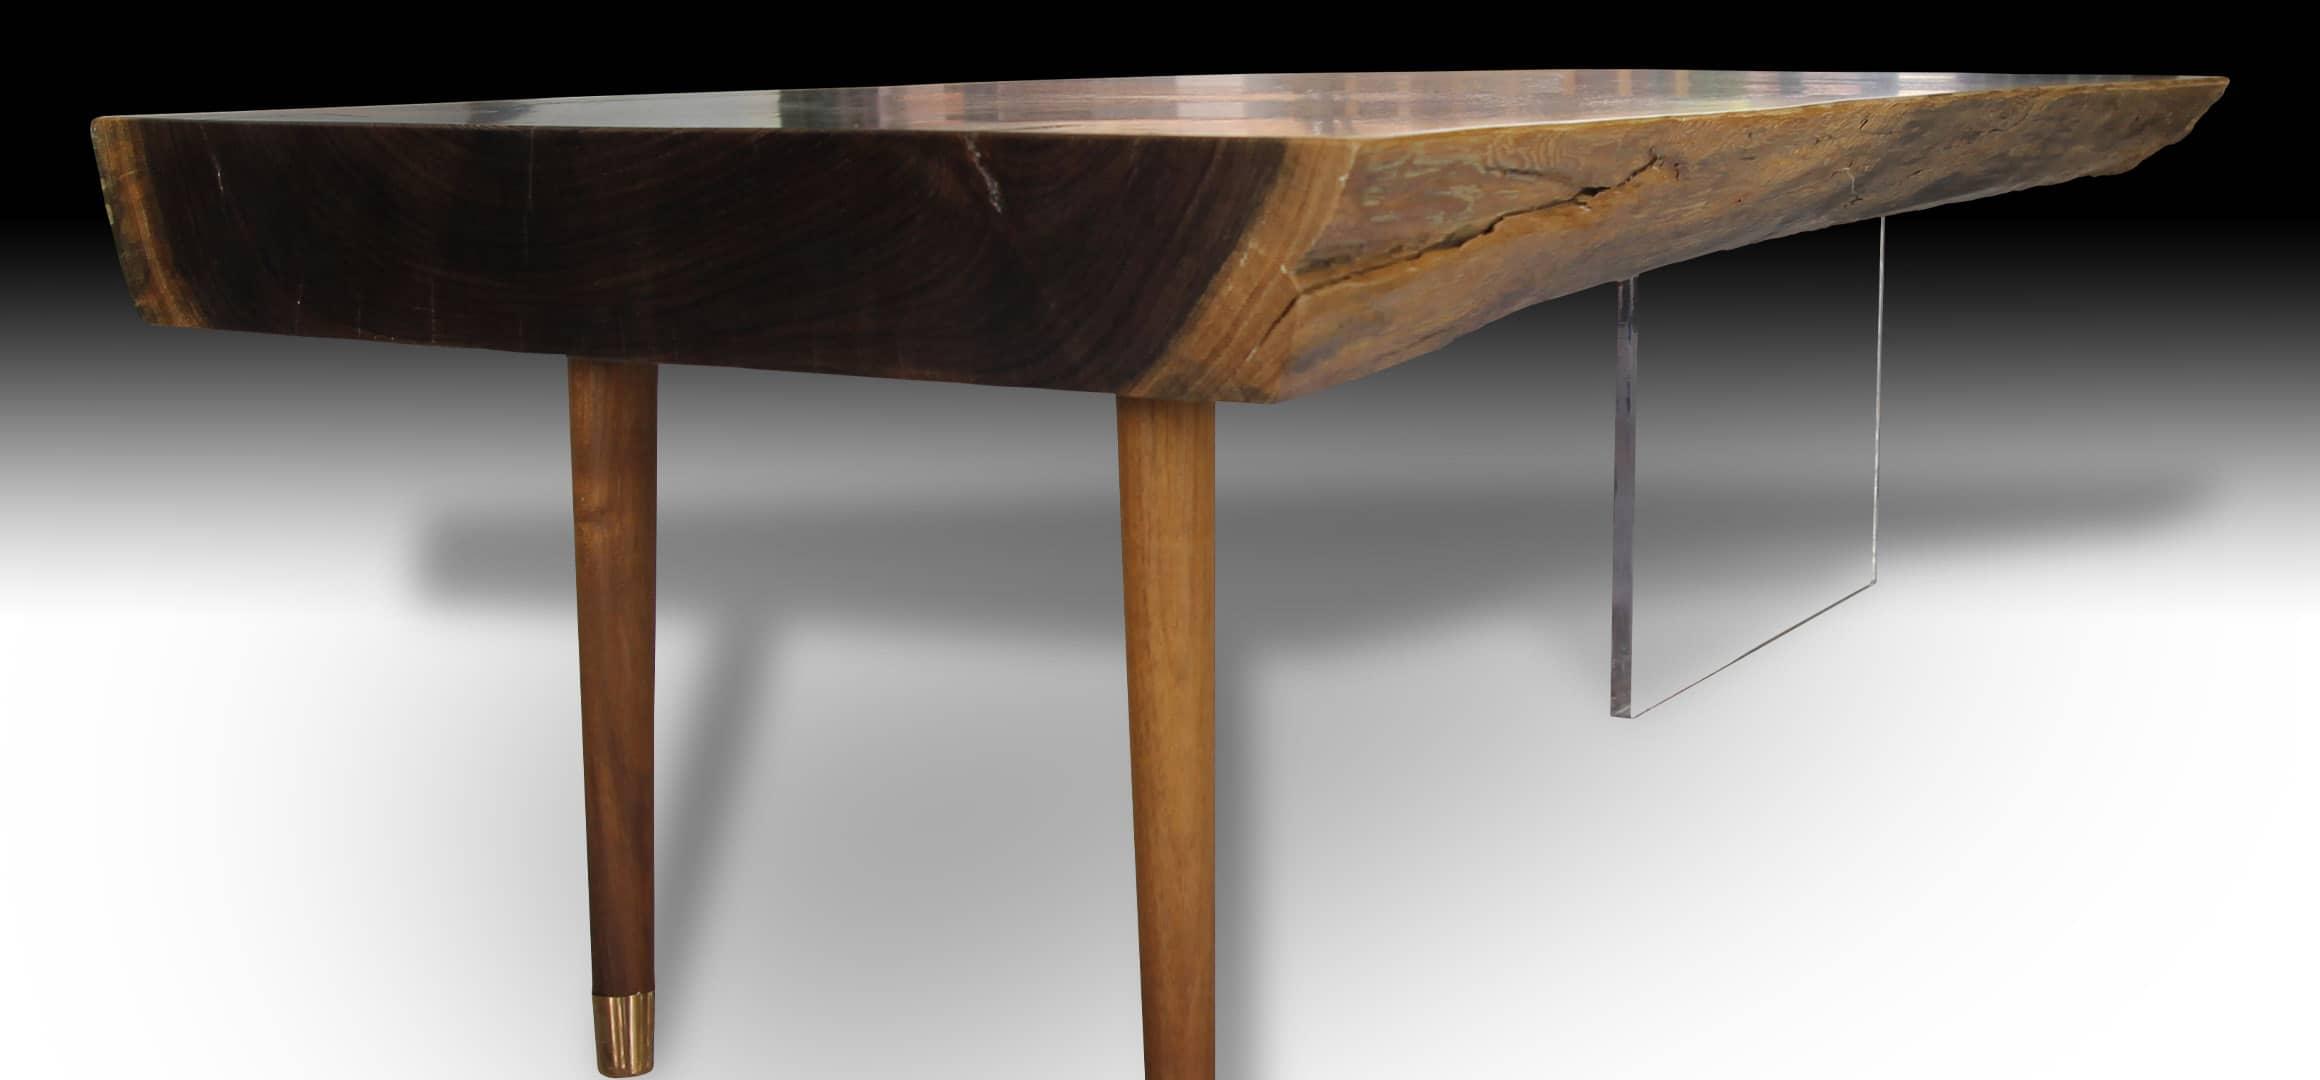 Phoenix live edge Walnut wood coffee table diagonal view